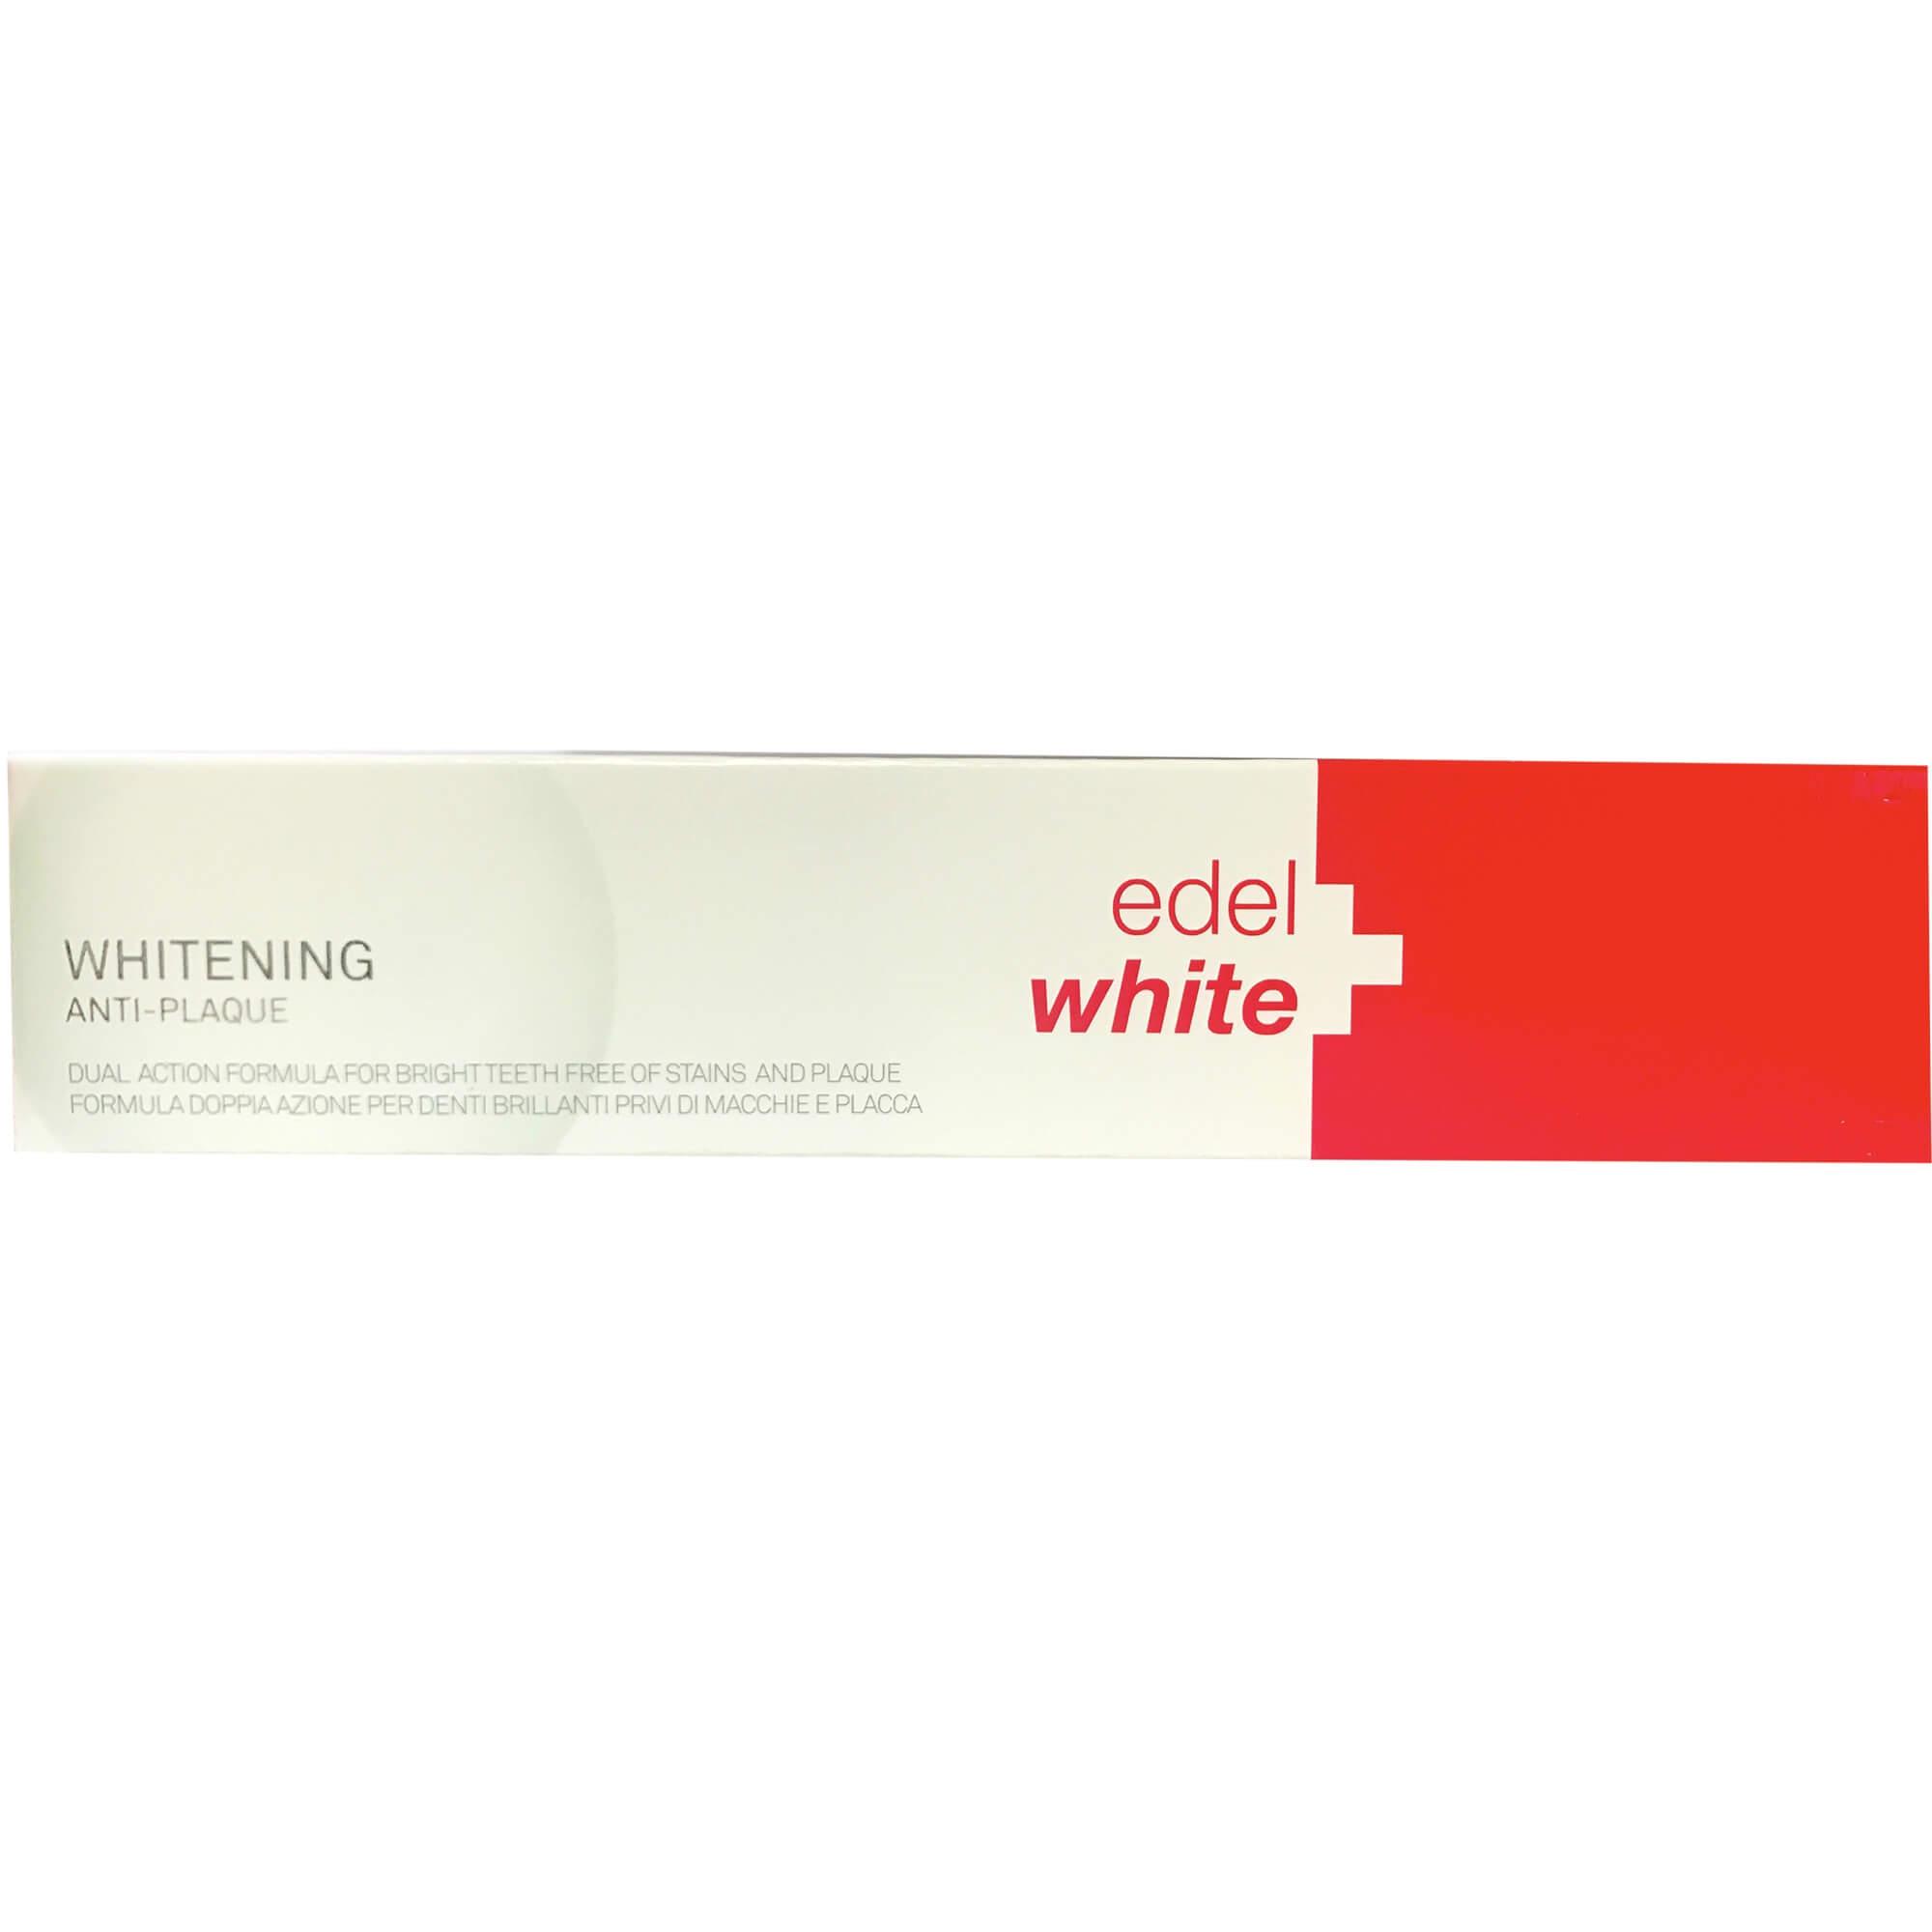 Edel White Whitening Anti-Plaque Οδοντόκρεμα Λεύκανσης 75ml